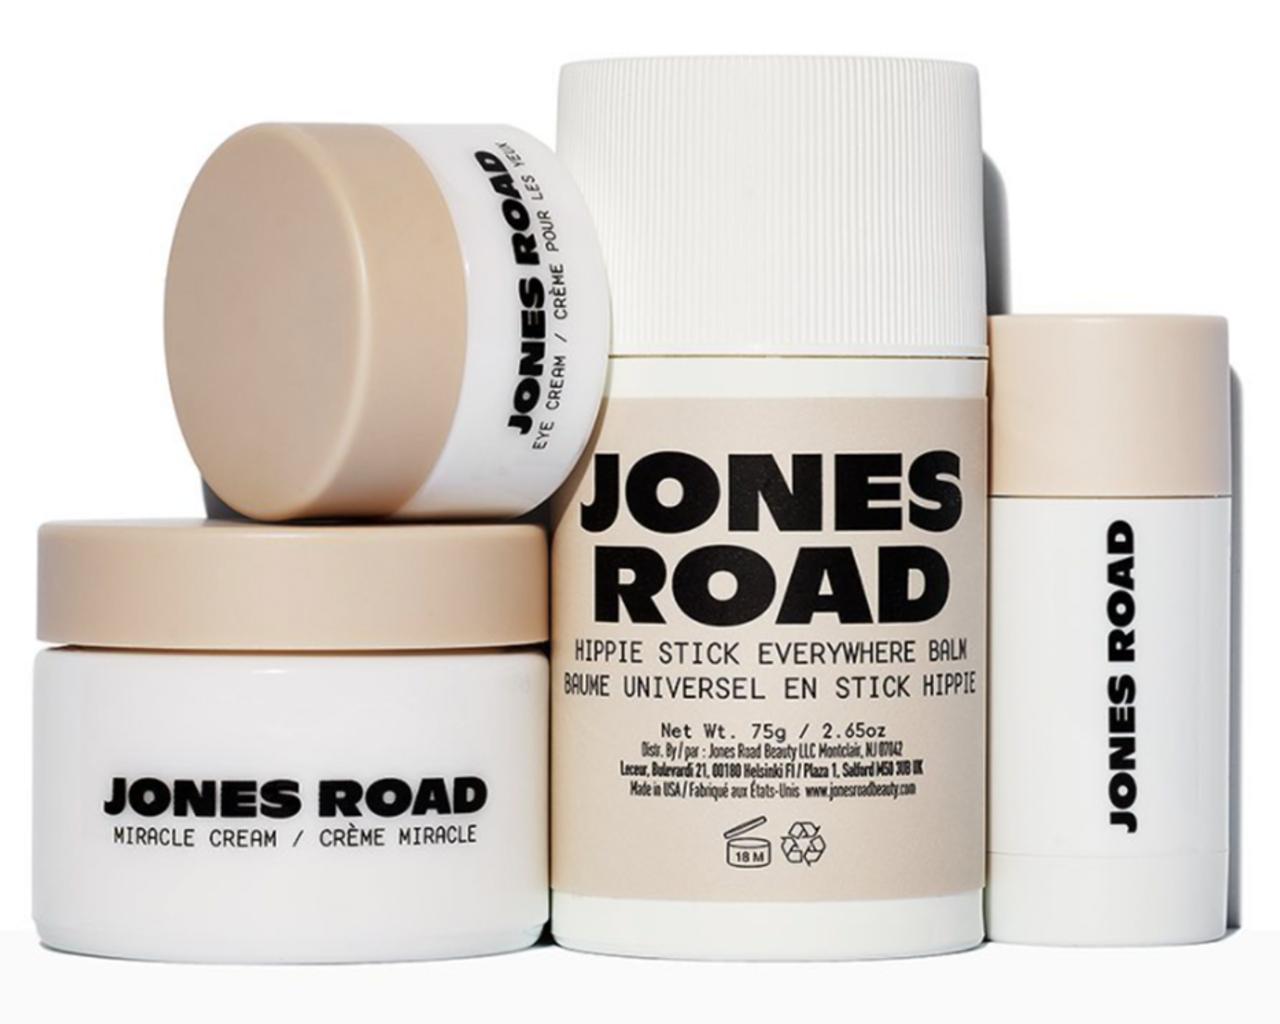 Jones Road, skincare, skin, Jones Road Skincare